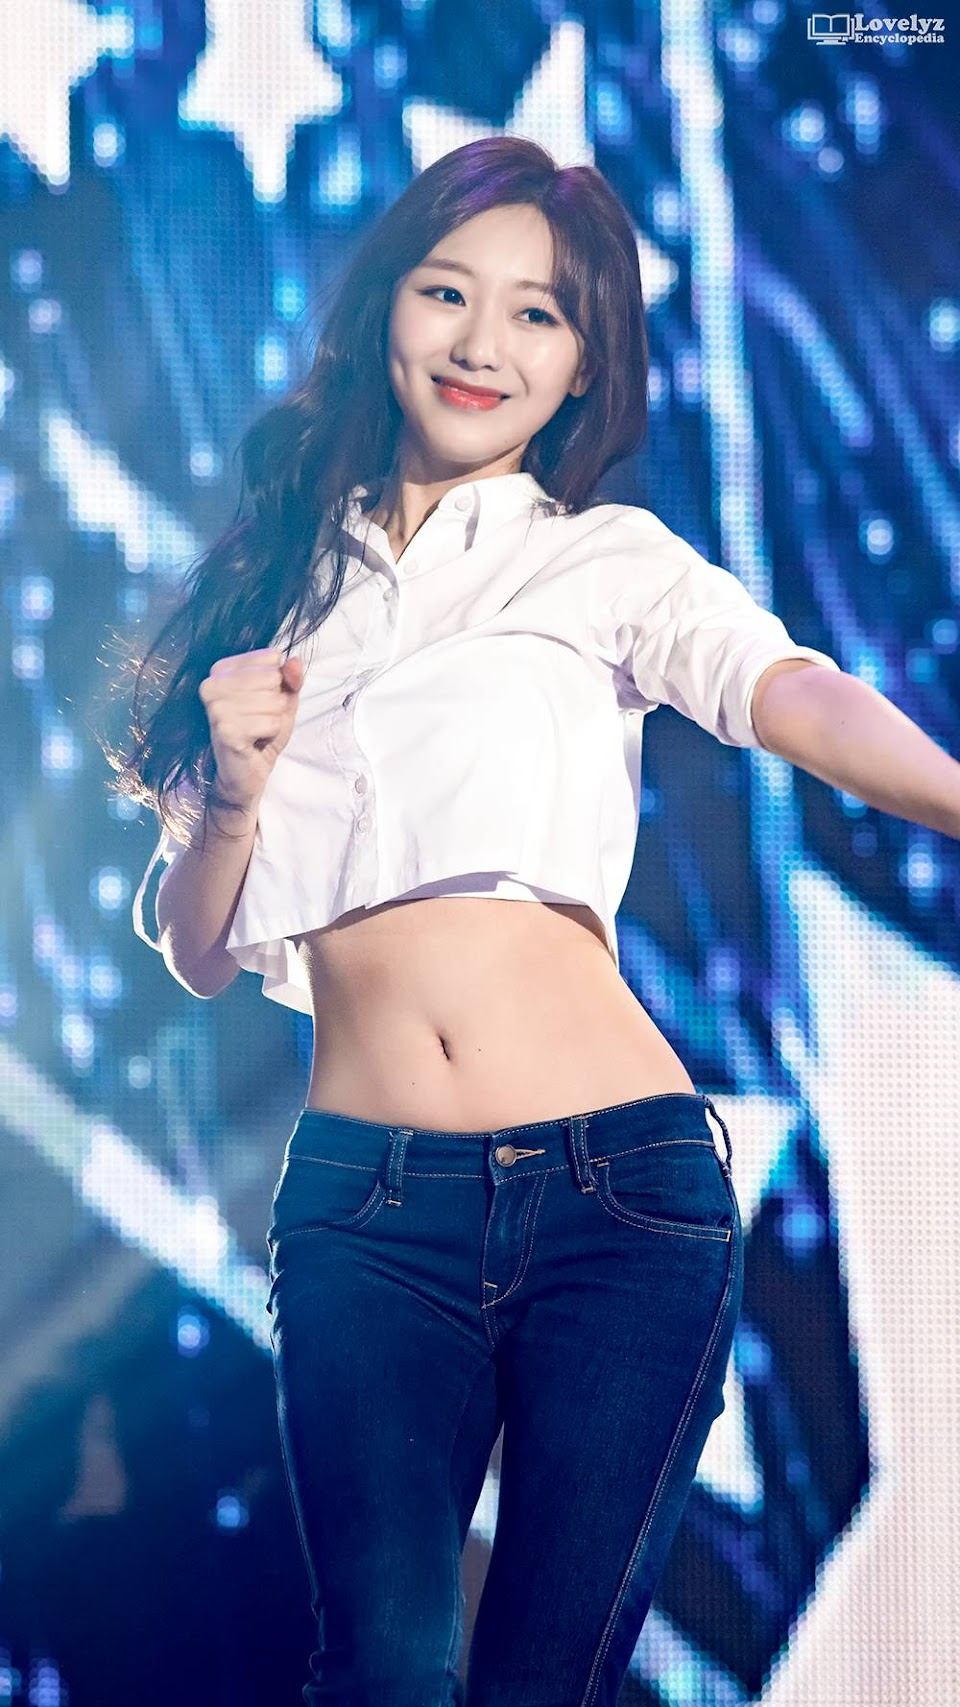 suejeong instiz